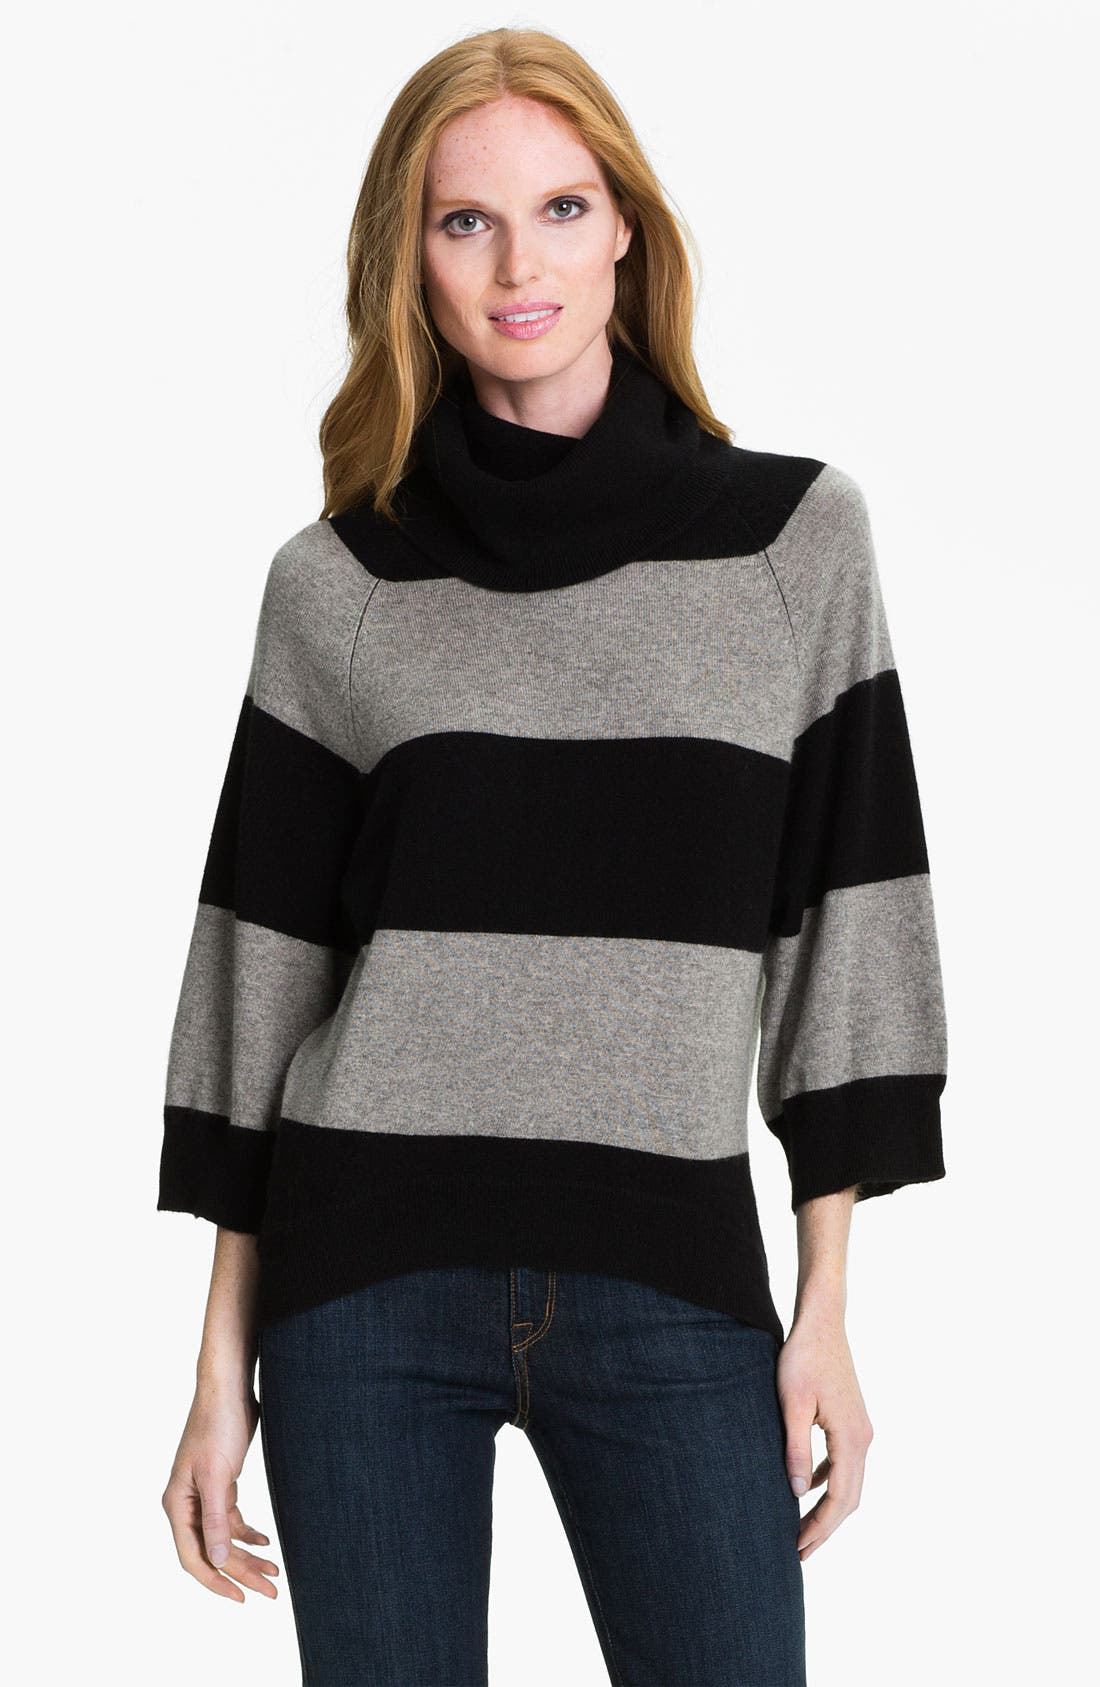 PURE AMICI, Stripe Cashmere Tunic, Main thumbnail 1, color, 001